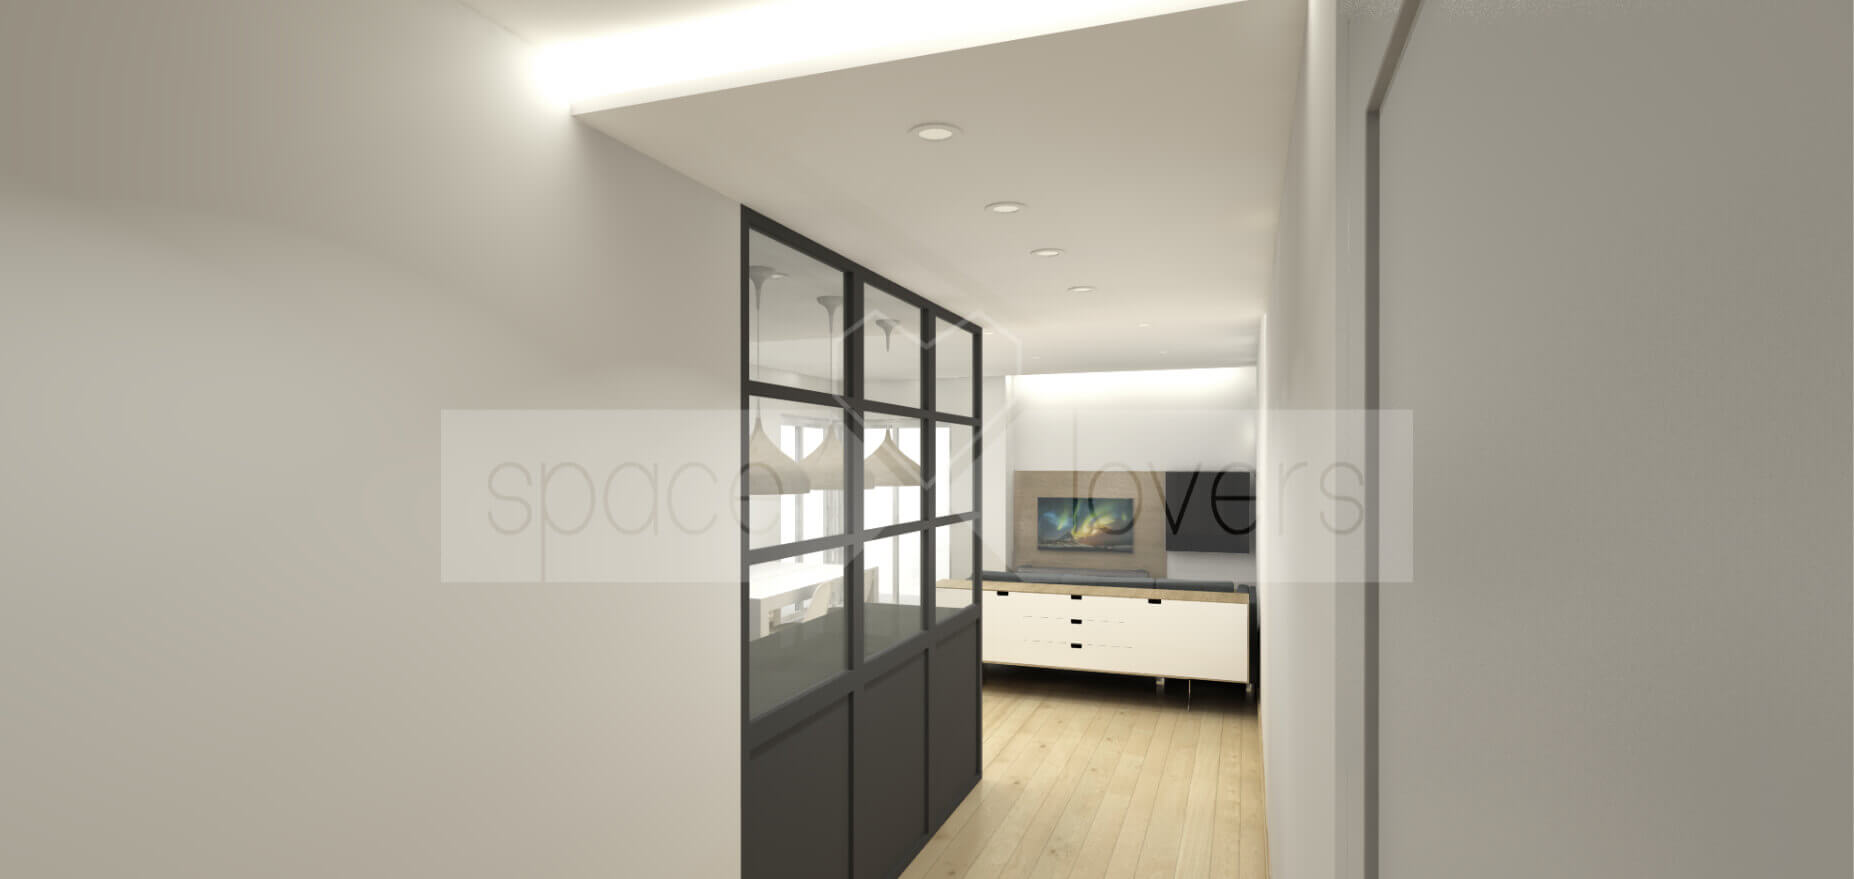 remodelacao-apartamento-parque-das-nacoes-lisboa-cozinha-industrial-hall